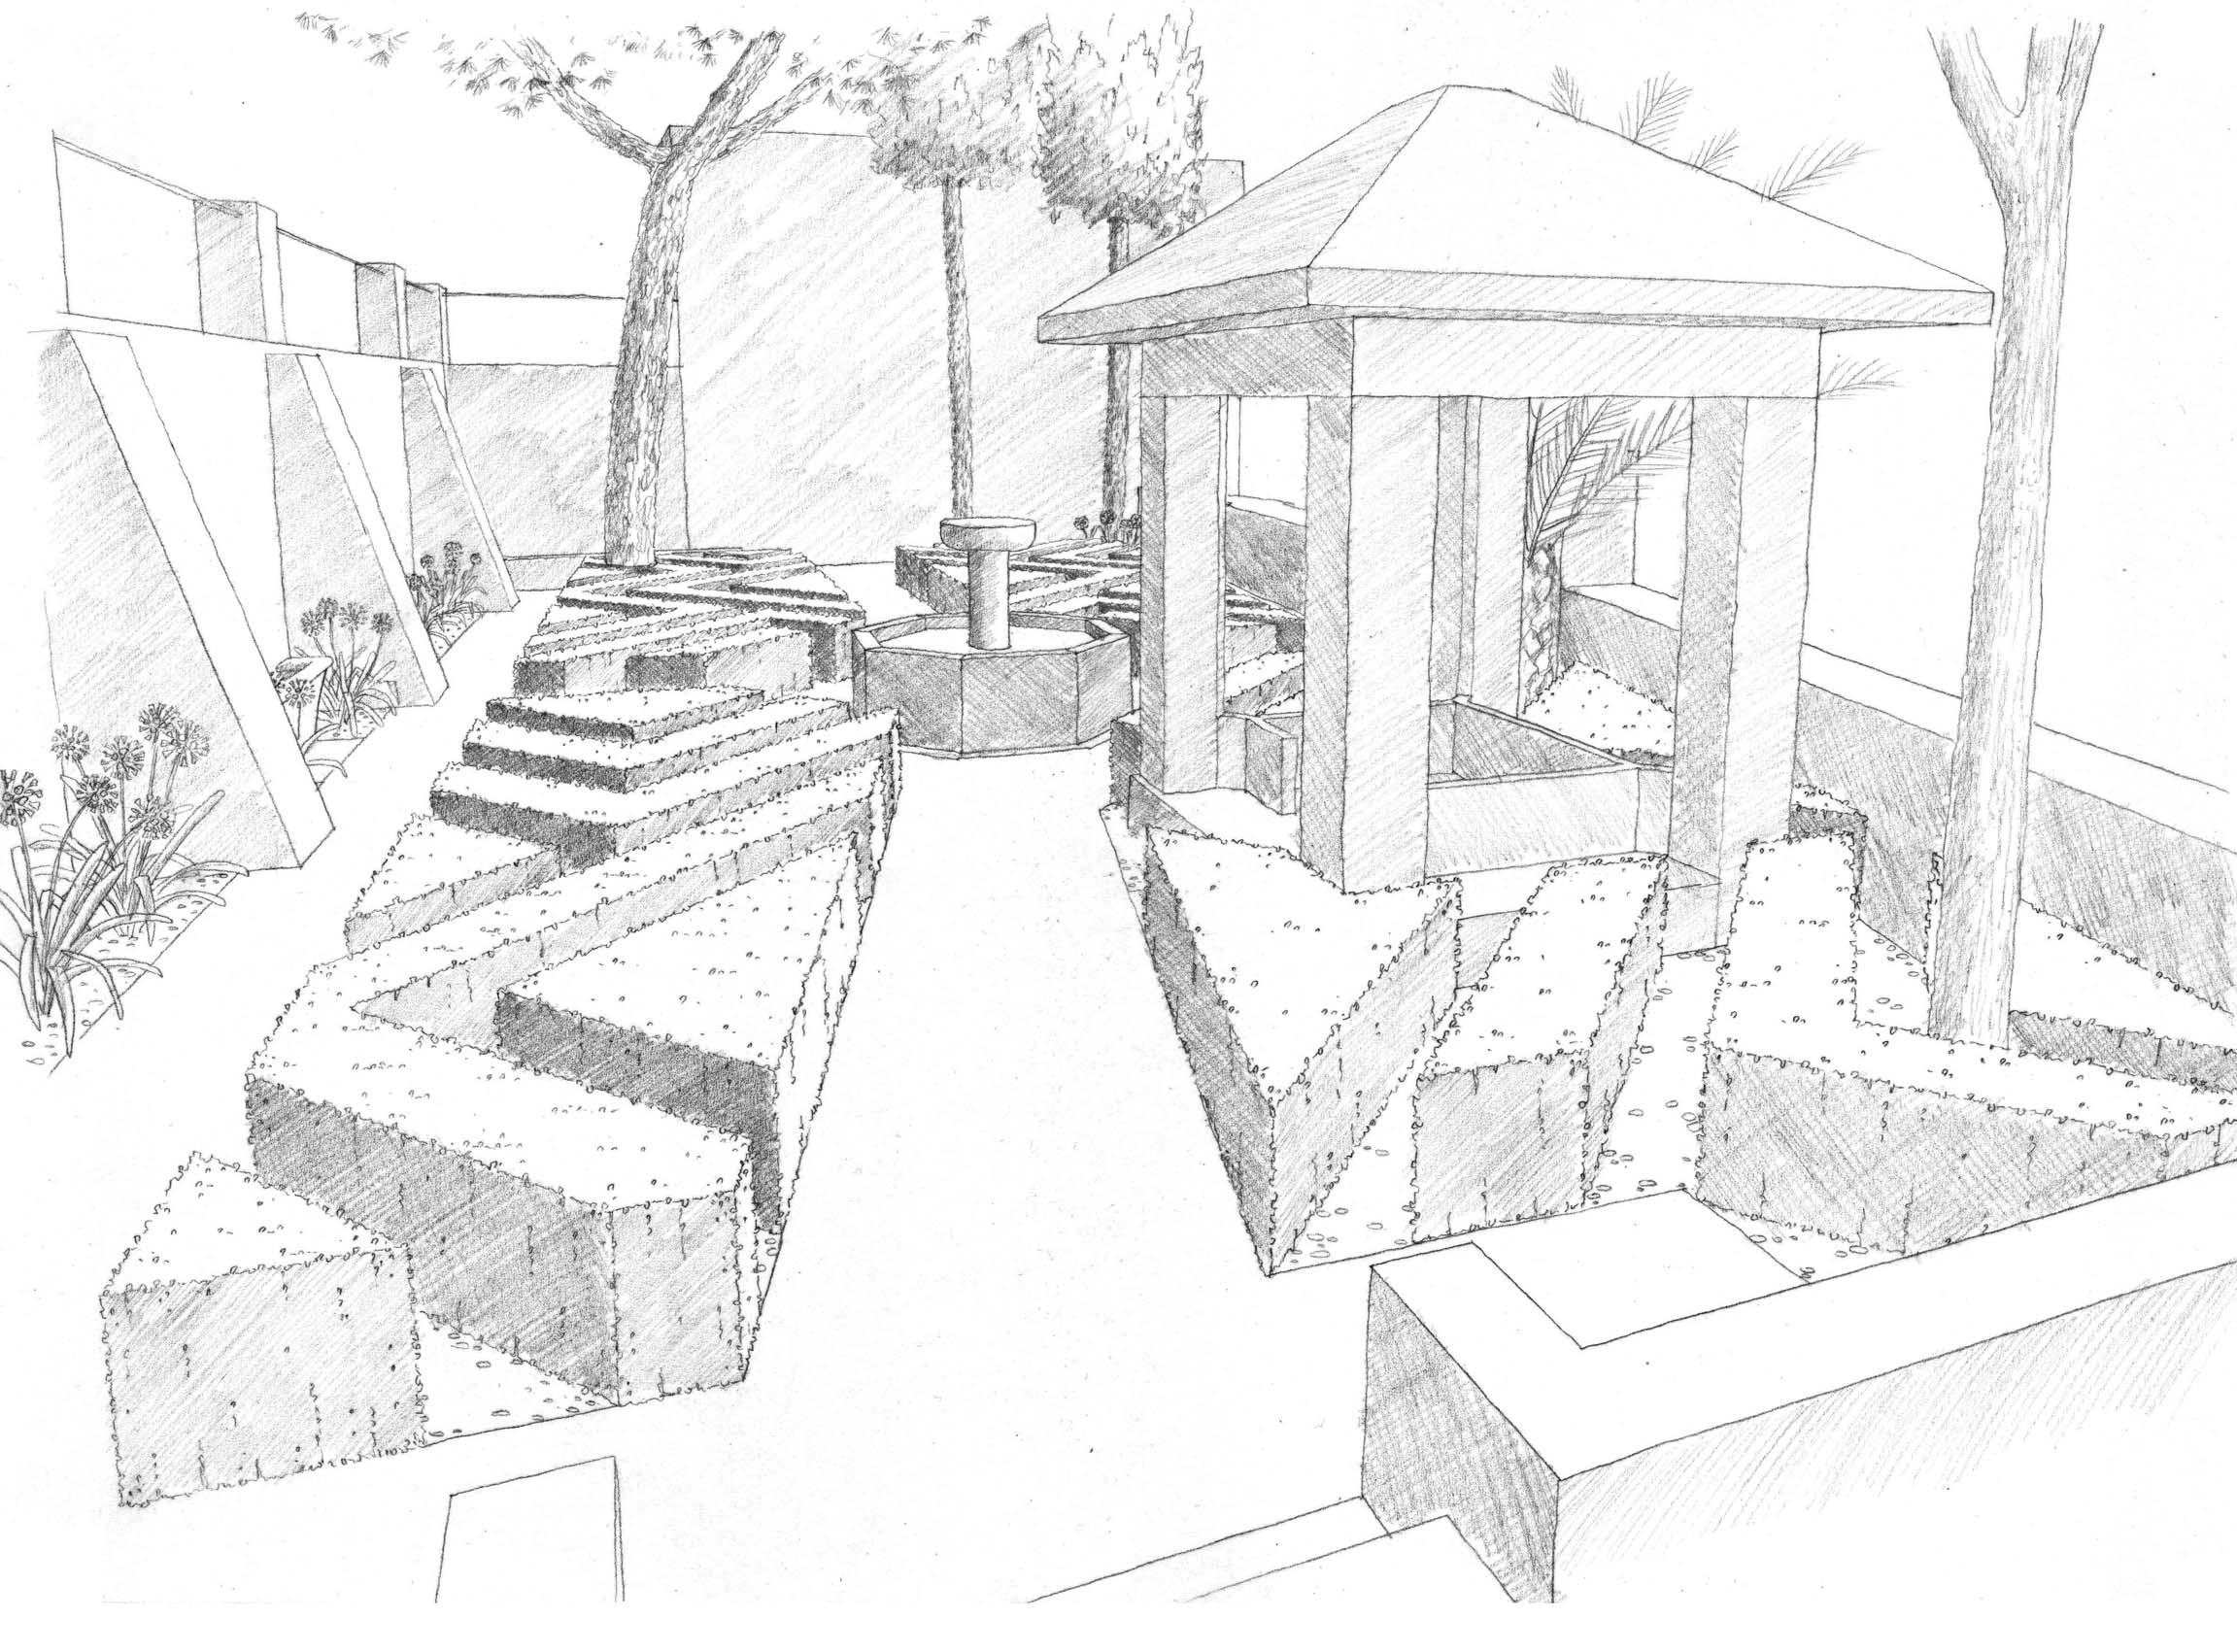 2303x1701 Landscape drawings Landscaping Pinterest Landscape drawings